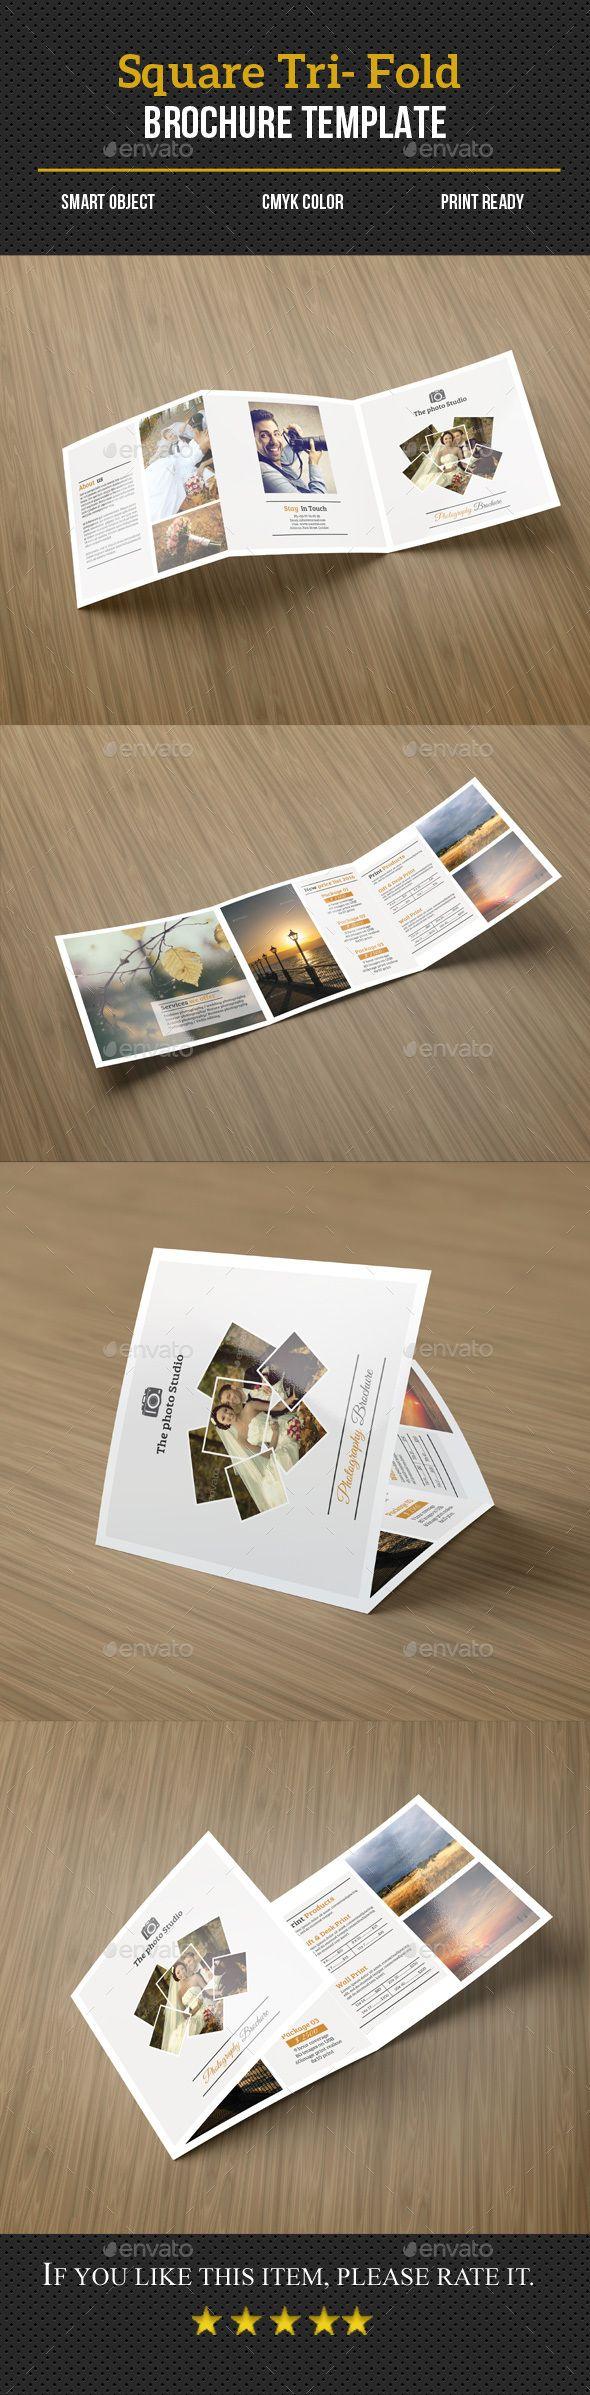 Photography Pricing List Brochure Brochure Template Brochures - Price list brochure template